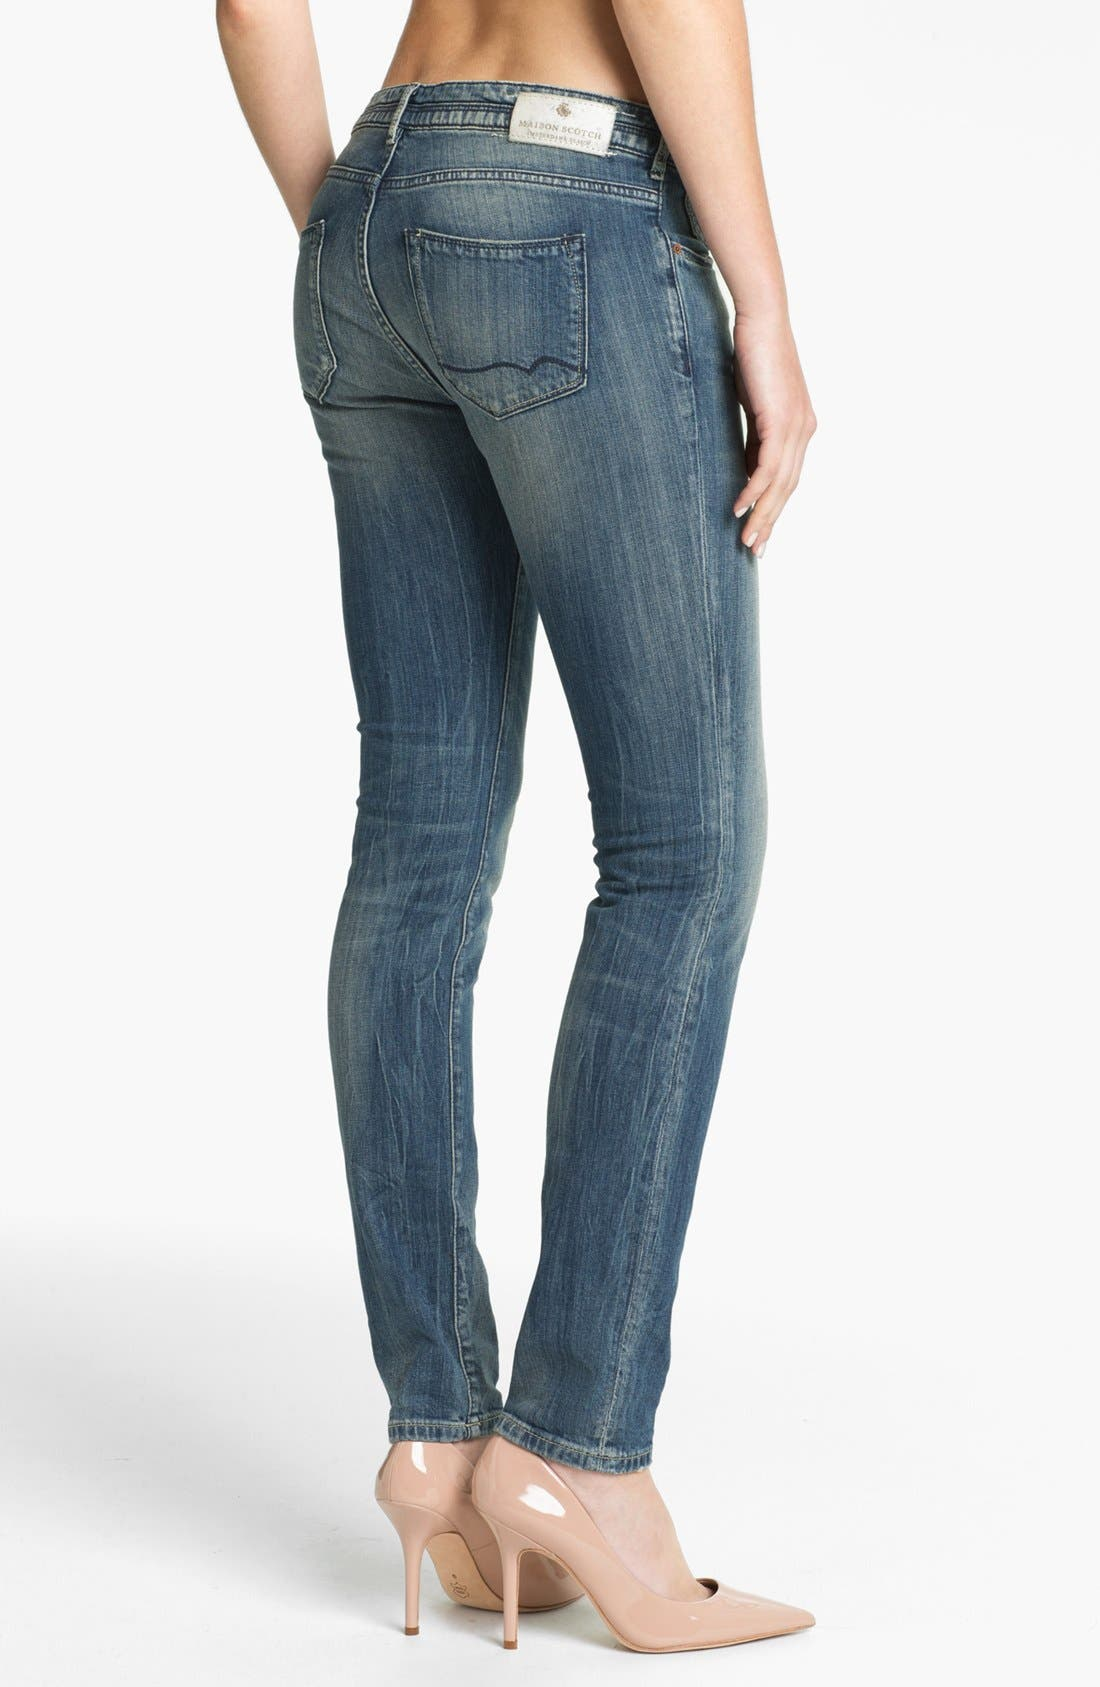 Alternate Image 2  - Maison Scotch 'La Parisienne' Bleach Washed Skinny Jeans (Bleutiful)